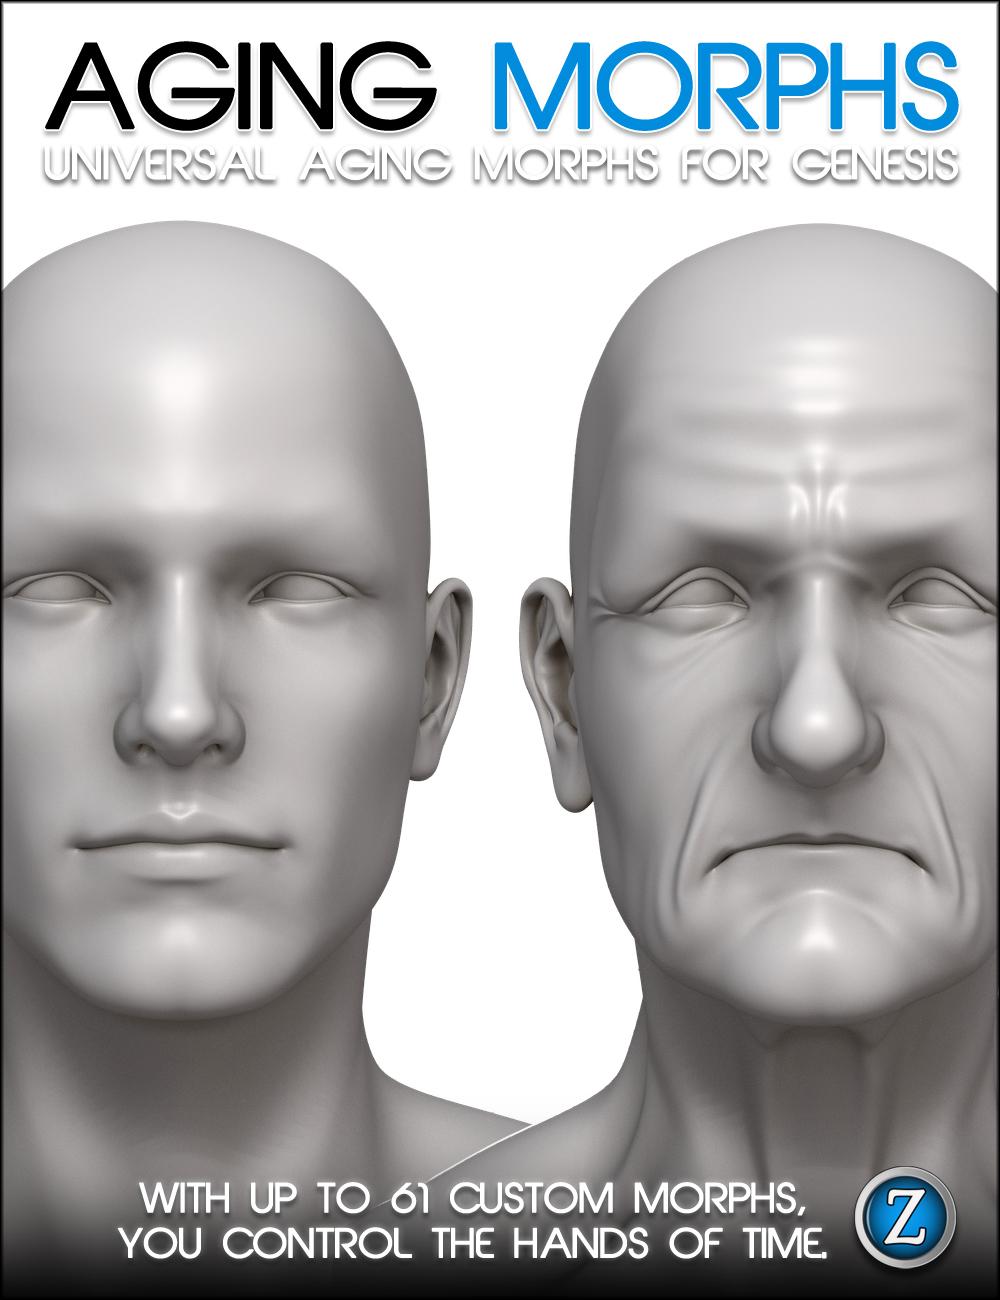 Aging Morphs For Genesis by: Zev0, 3D Models by Daz 3D